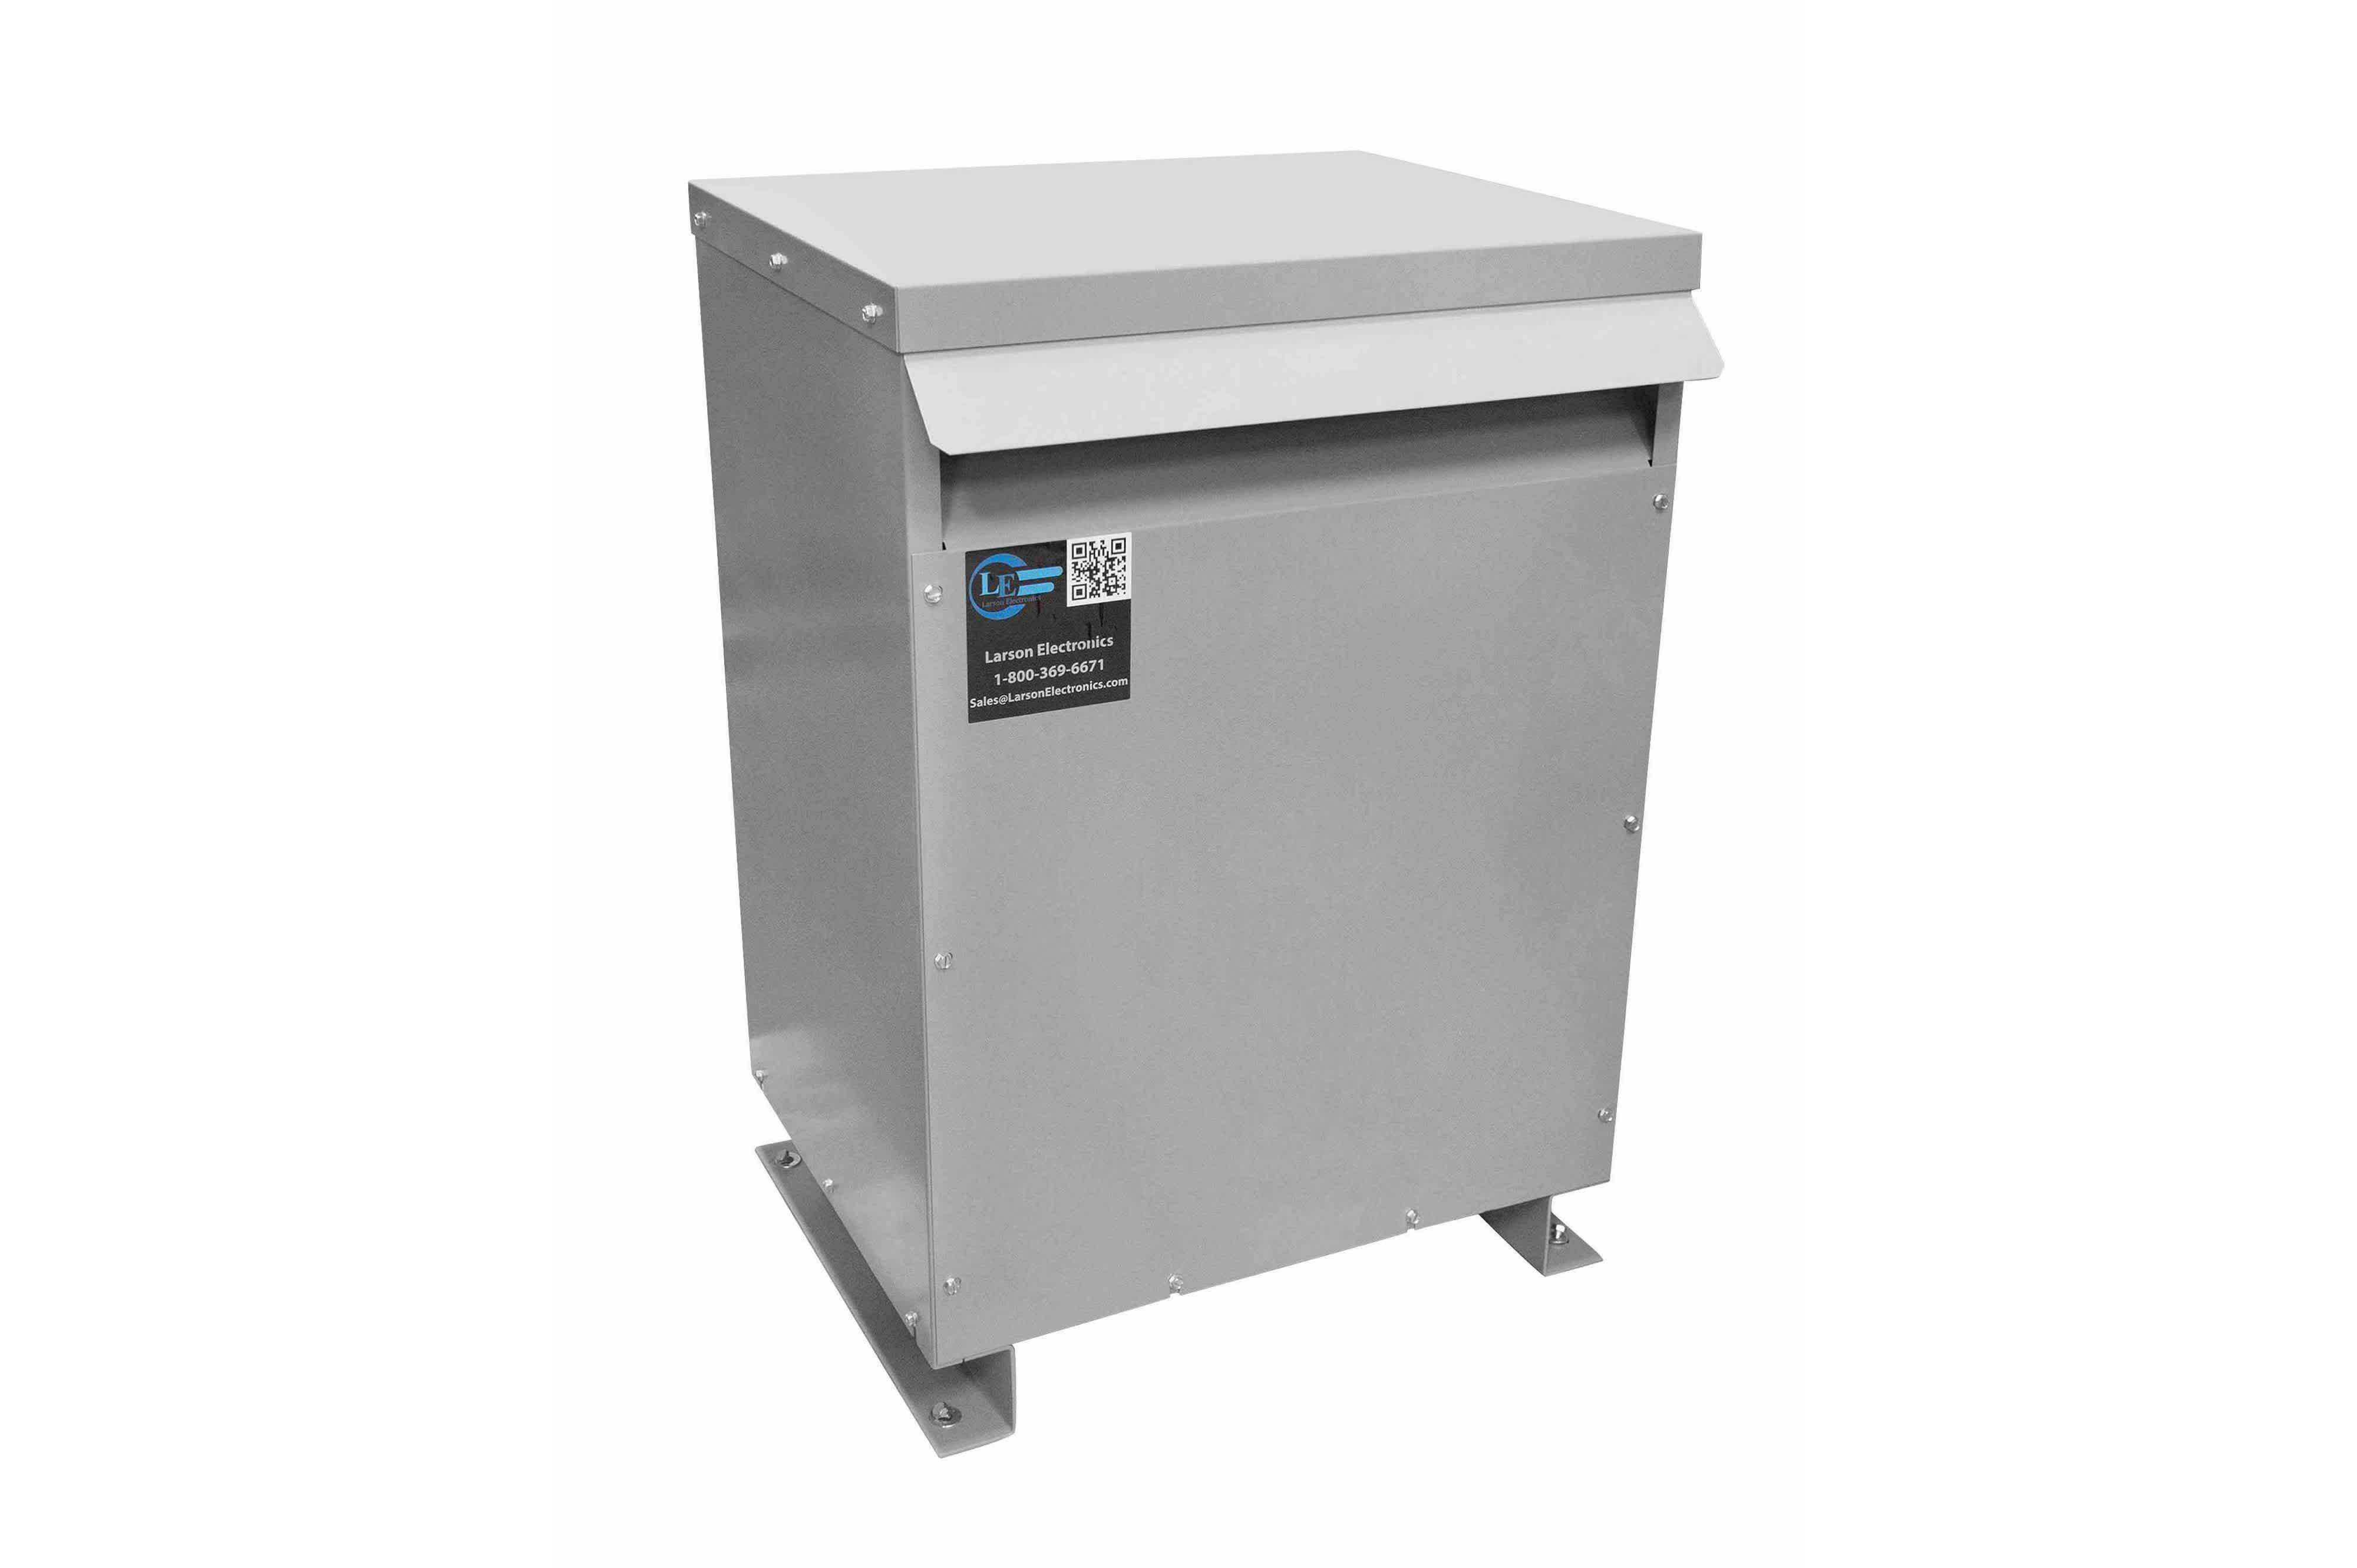 27 kVA 3PH Isolation Transformer, 230V Wye Primary, 208V Delta Secondary, N3R, Ventilated, 60 Hz